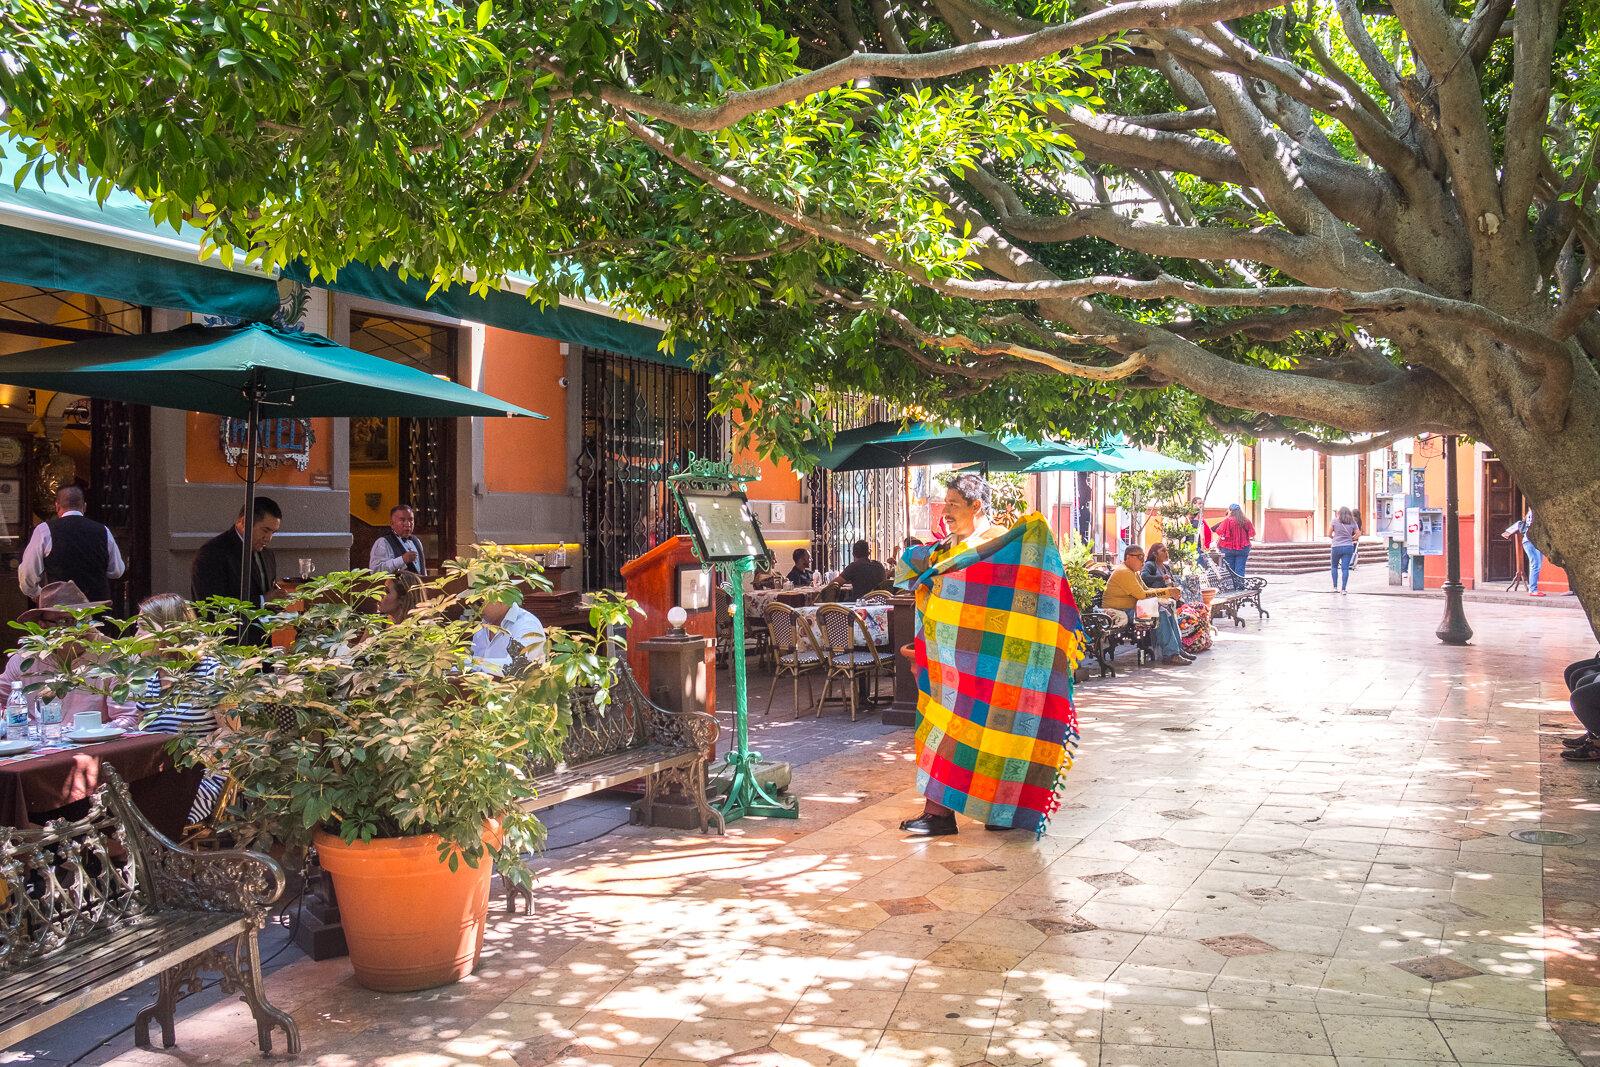 2019.10.8_Mexico_Guanajuato6_Britt first year.jpg